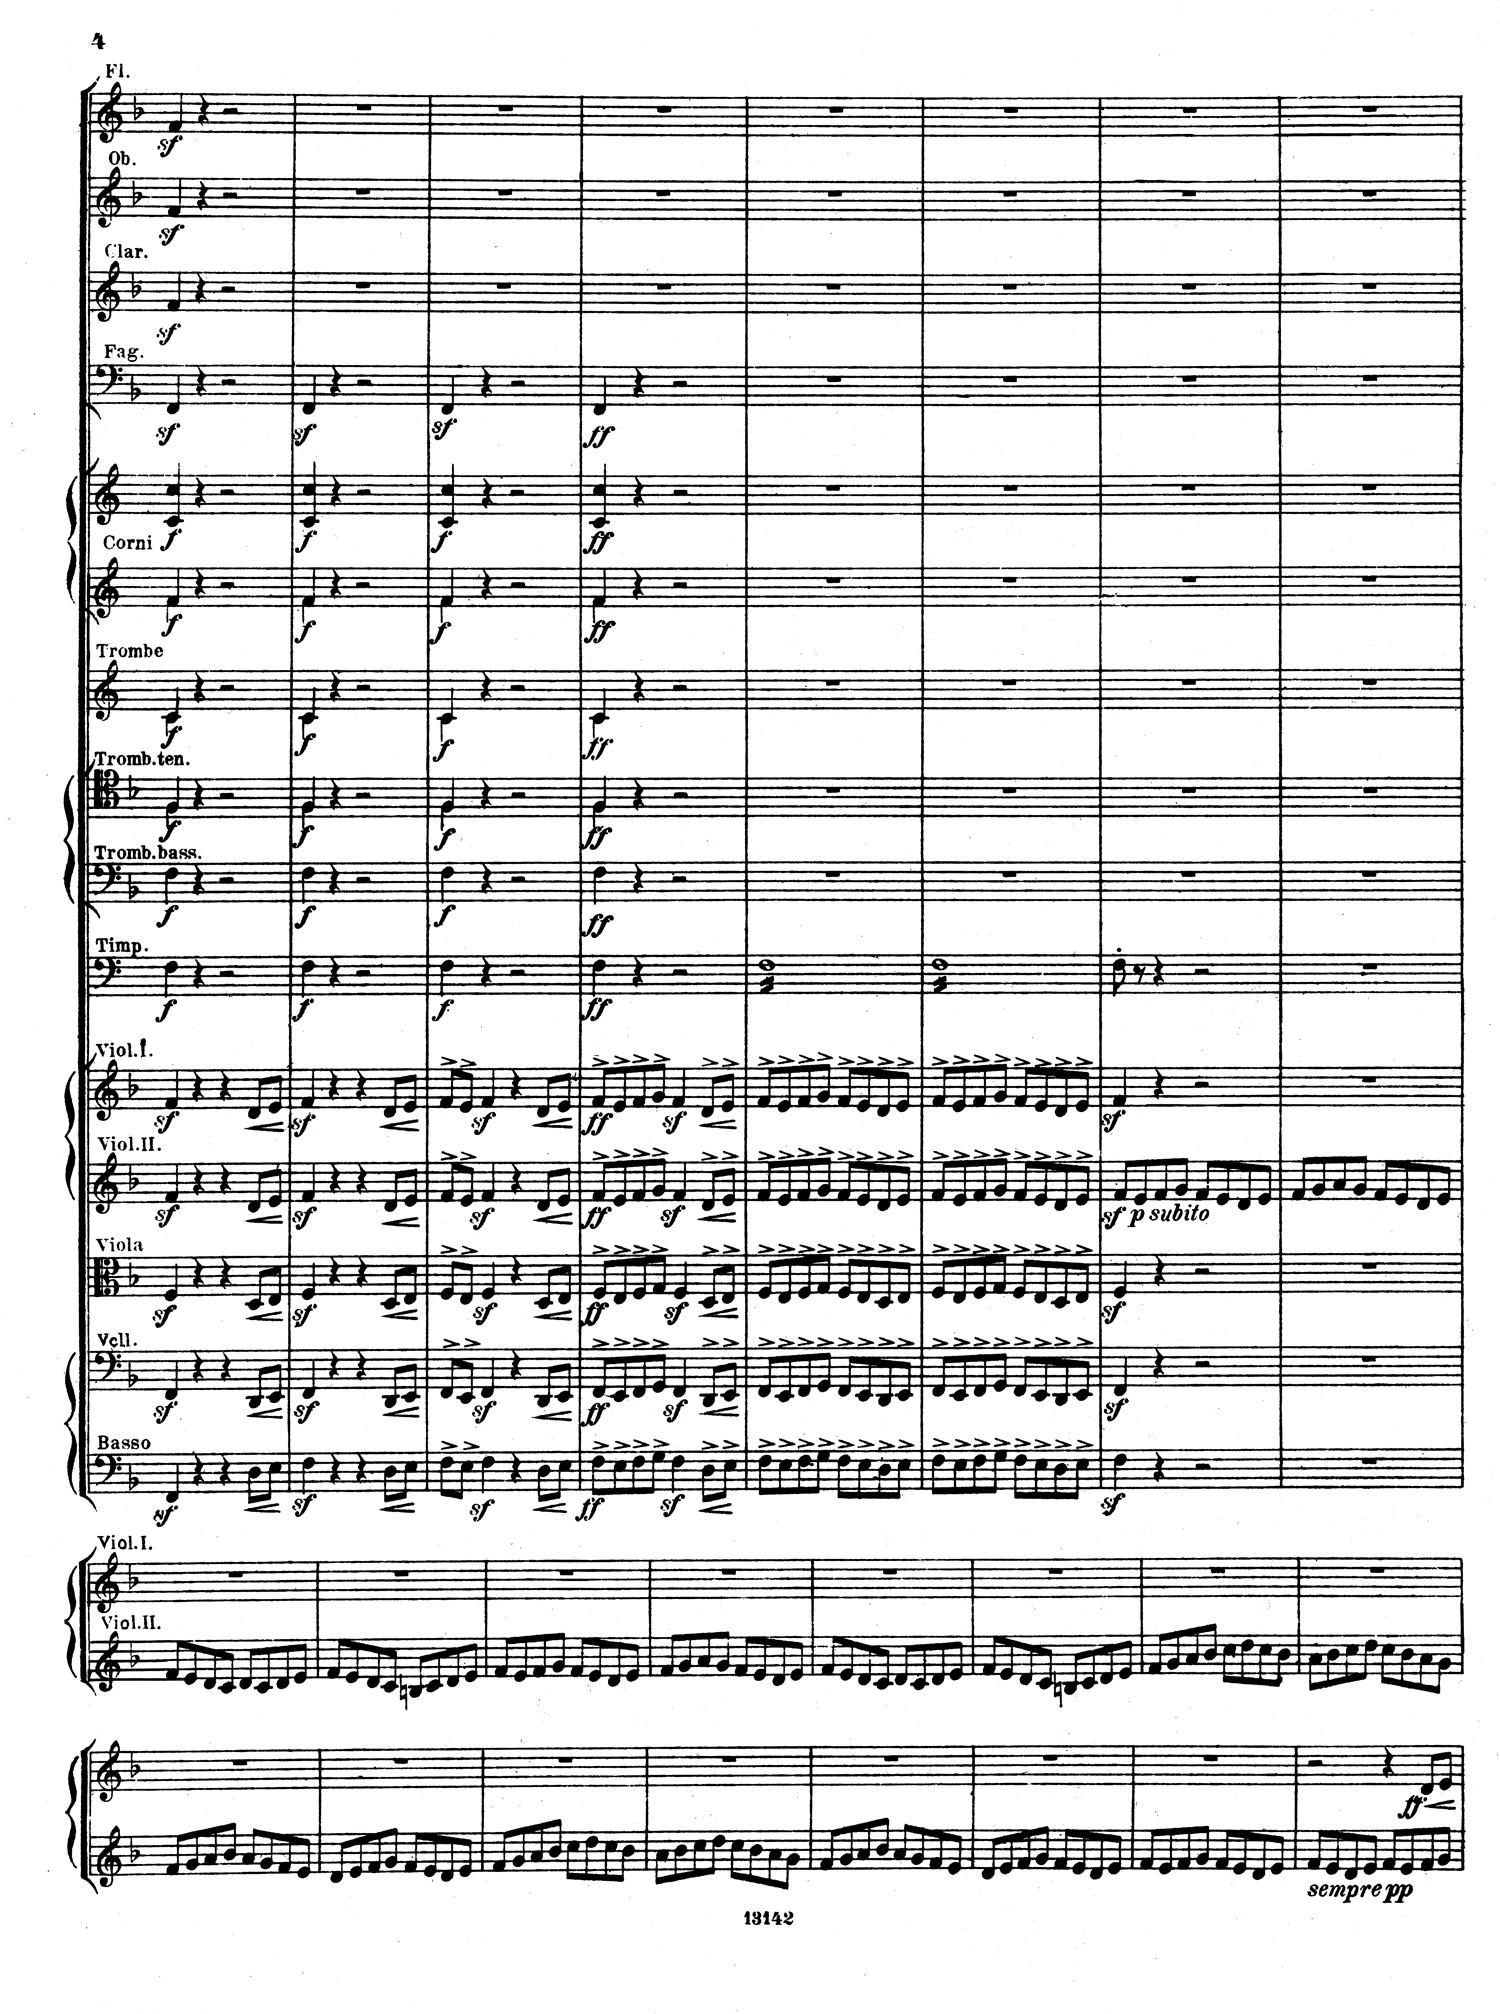 Smetana Score 2.jpg